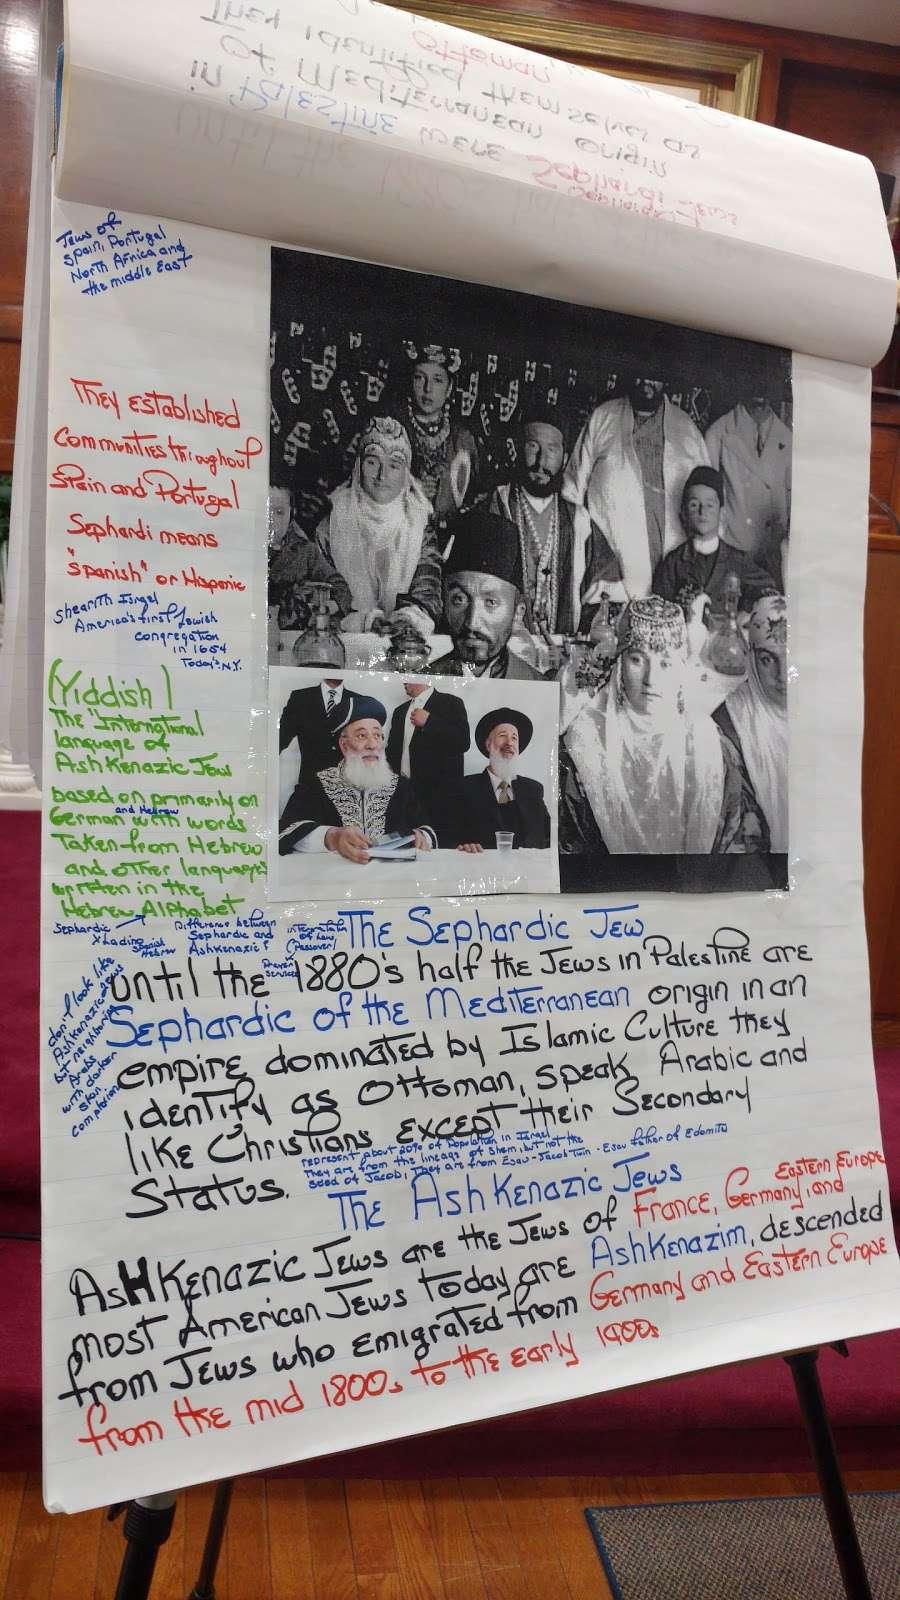 Grace Bible Class Church - church  | Photo 1 of 1 | Address: 54 Pine St, Passaic, NJ 07055, USA | Phone: (973) 779-4395